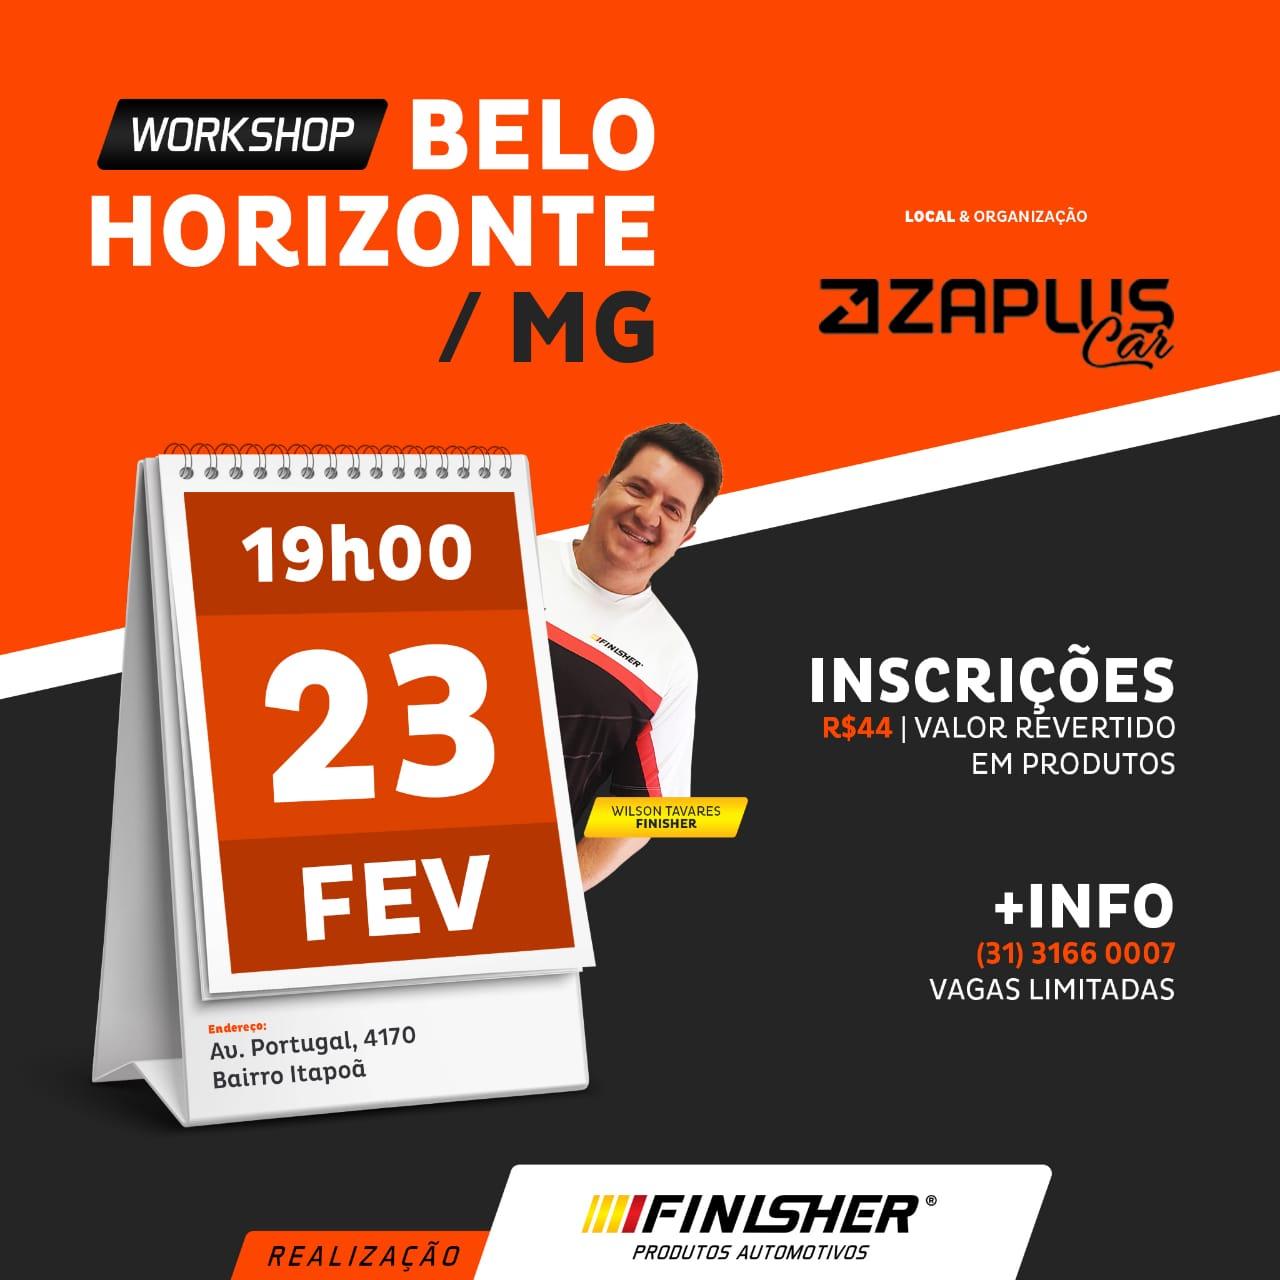 Workshop (Saíba tudo da marca Finisher) - Dia 23/02/2020 às 19h